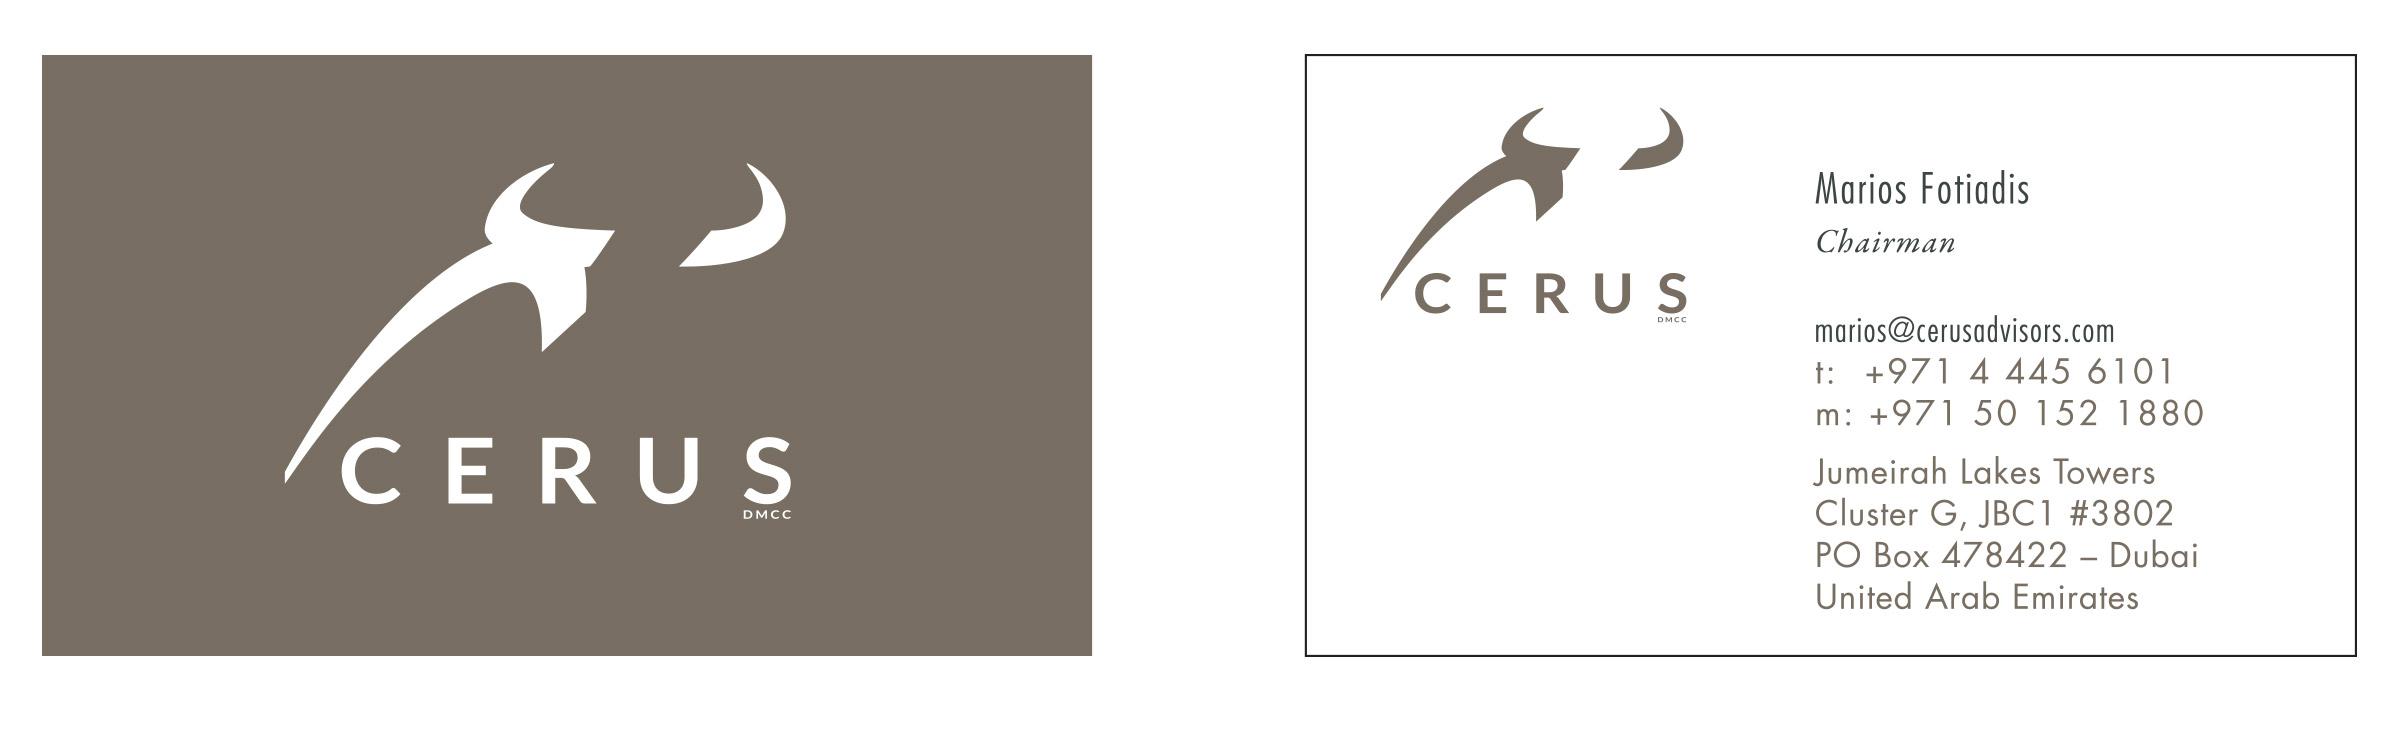 Cerus Print Piece 1